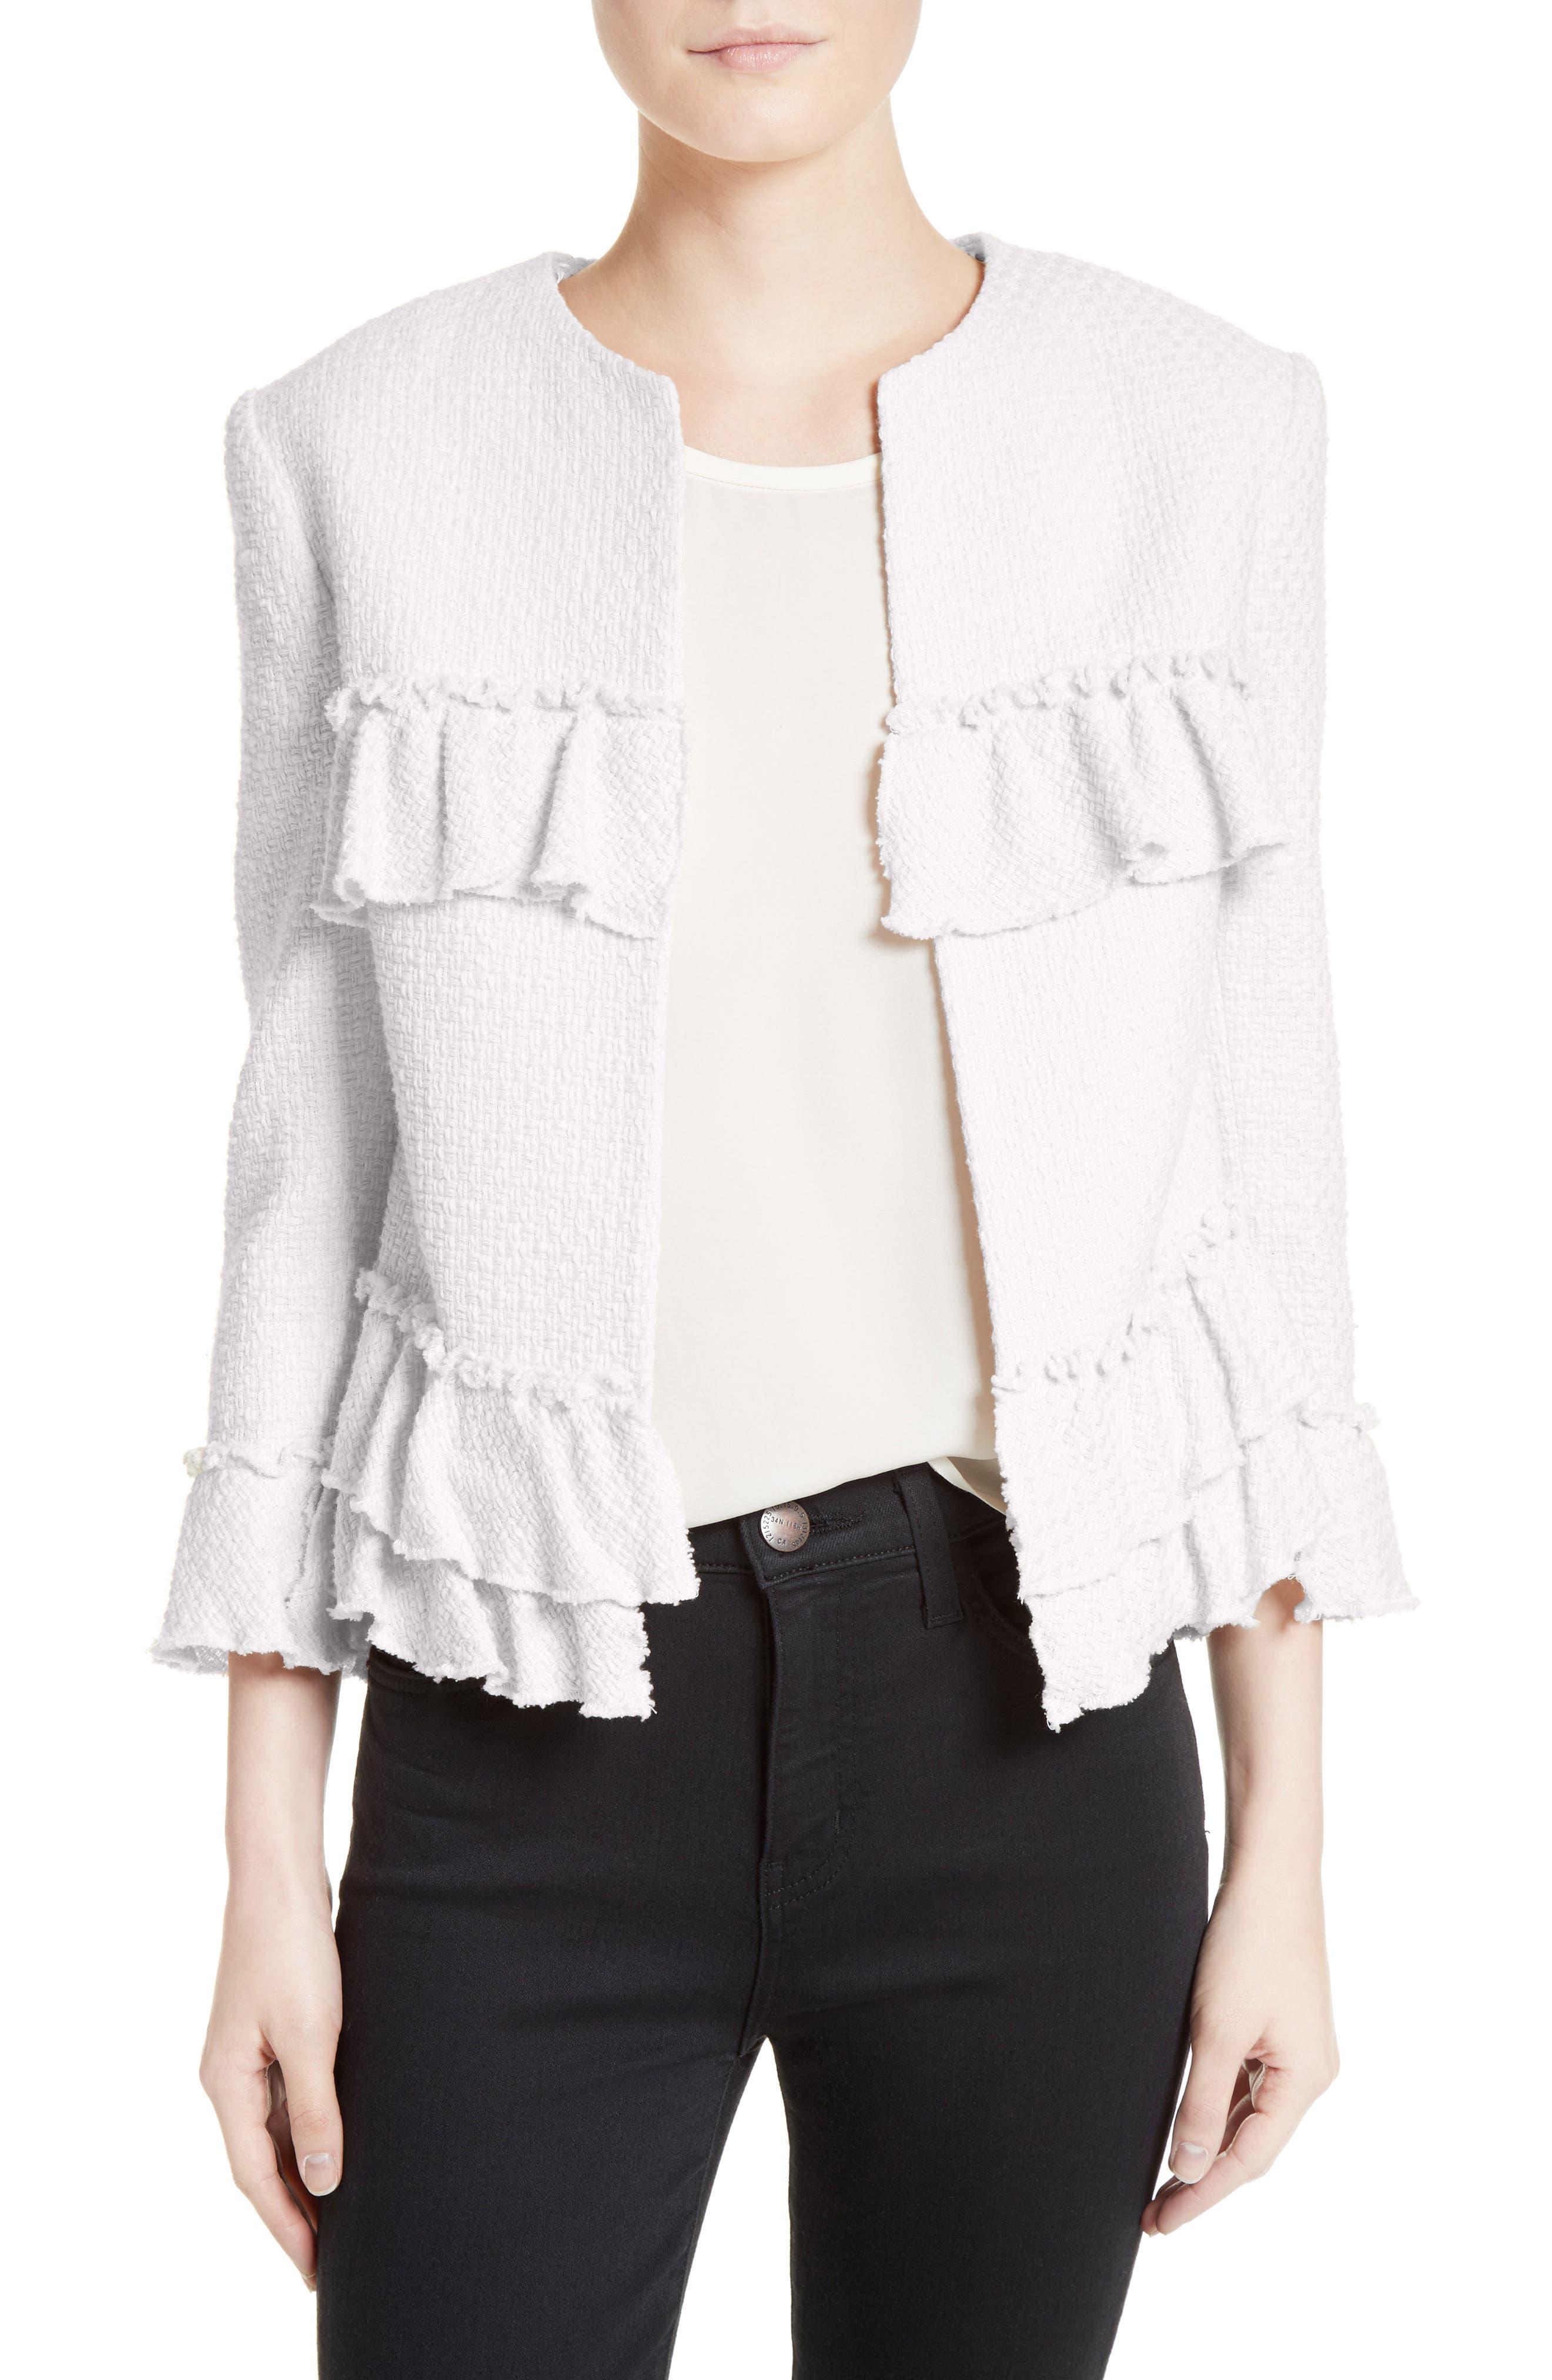 Main Image - Helene Berman Frill Tweed Jacket